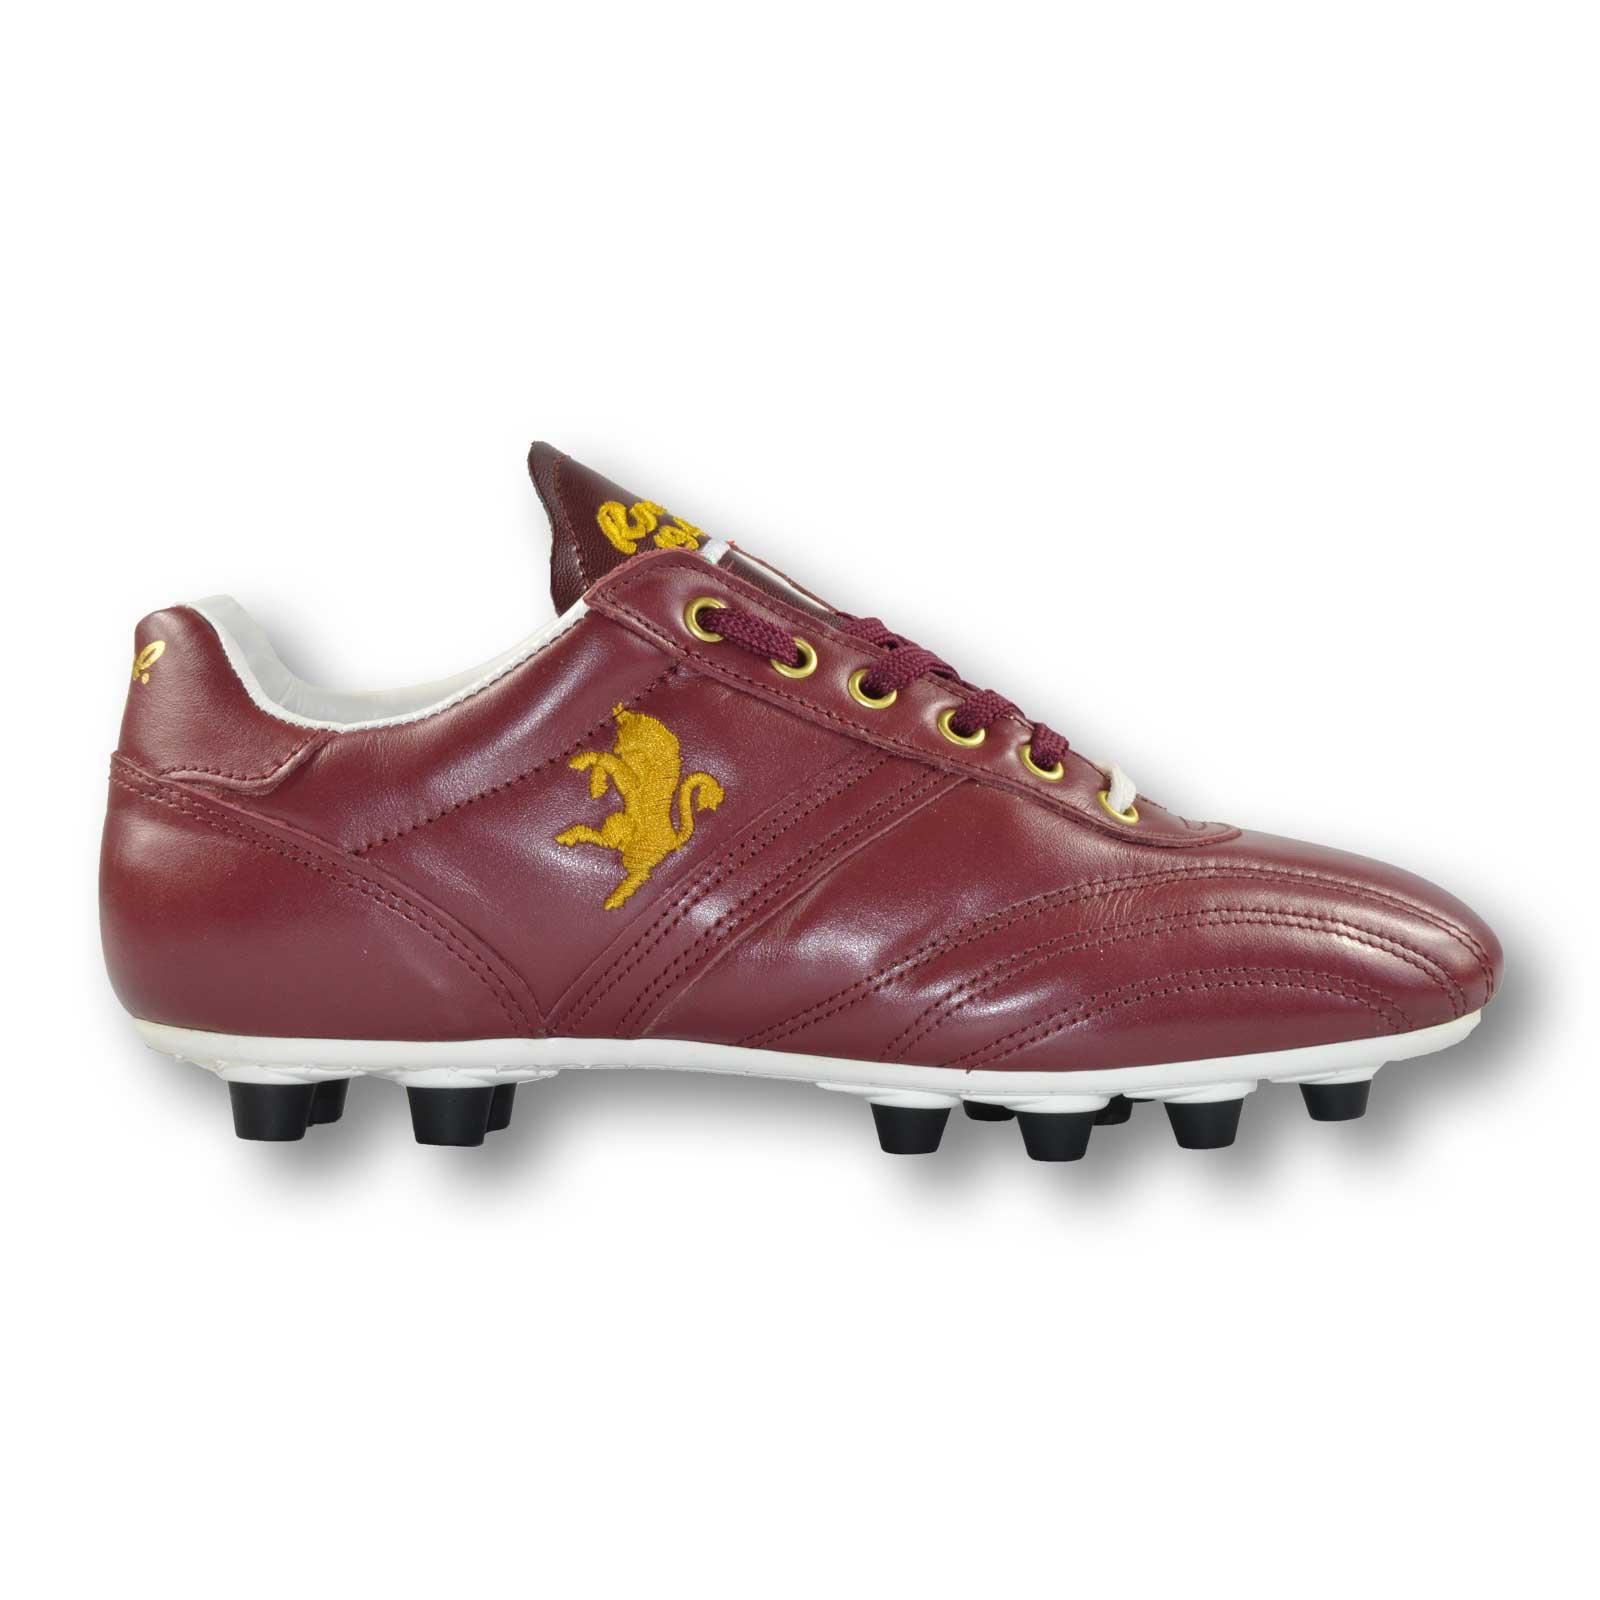 belle scarpe Guantity limitata 100% qualità 70 Anni Top TORO FG - Ryal-Shop